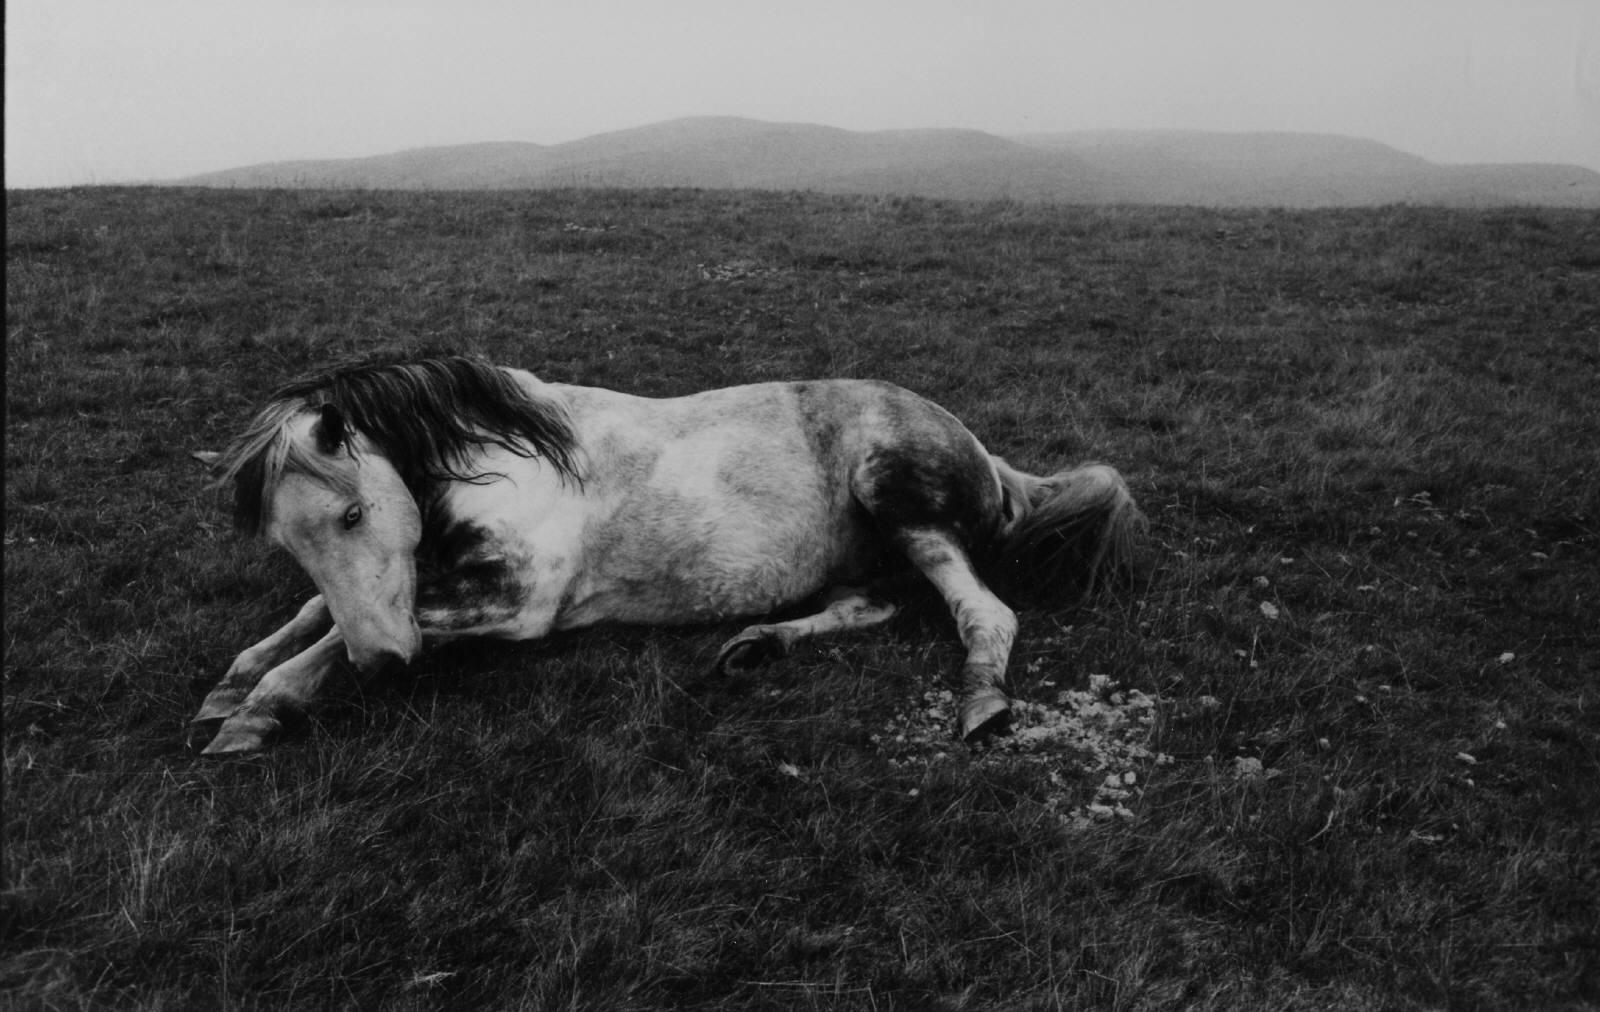 Anthony Luke's not just another photoblog Blog: Photographer